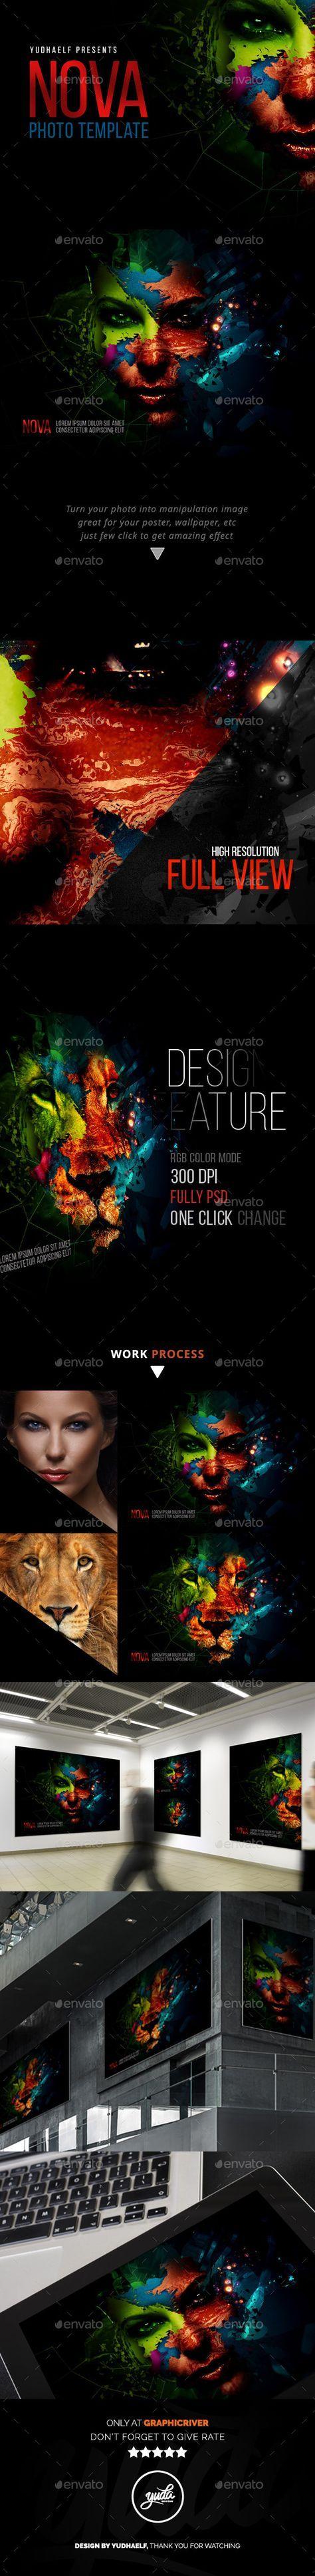 Nova - Artistic Photo Template #photography #psd Download: http://graphicriver.net/item/nova-artistic-photo-template-/12022529?ref=ksioks